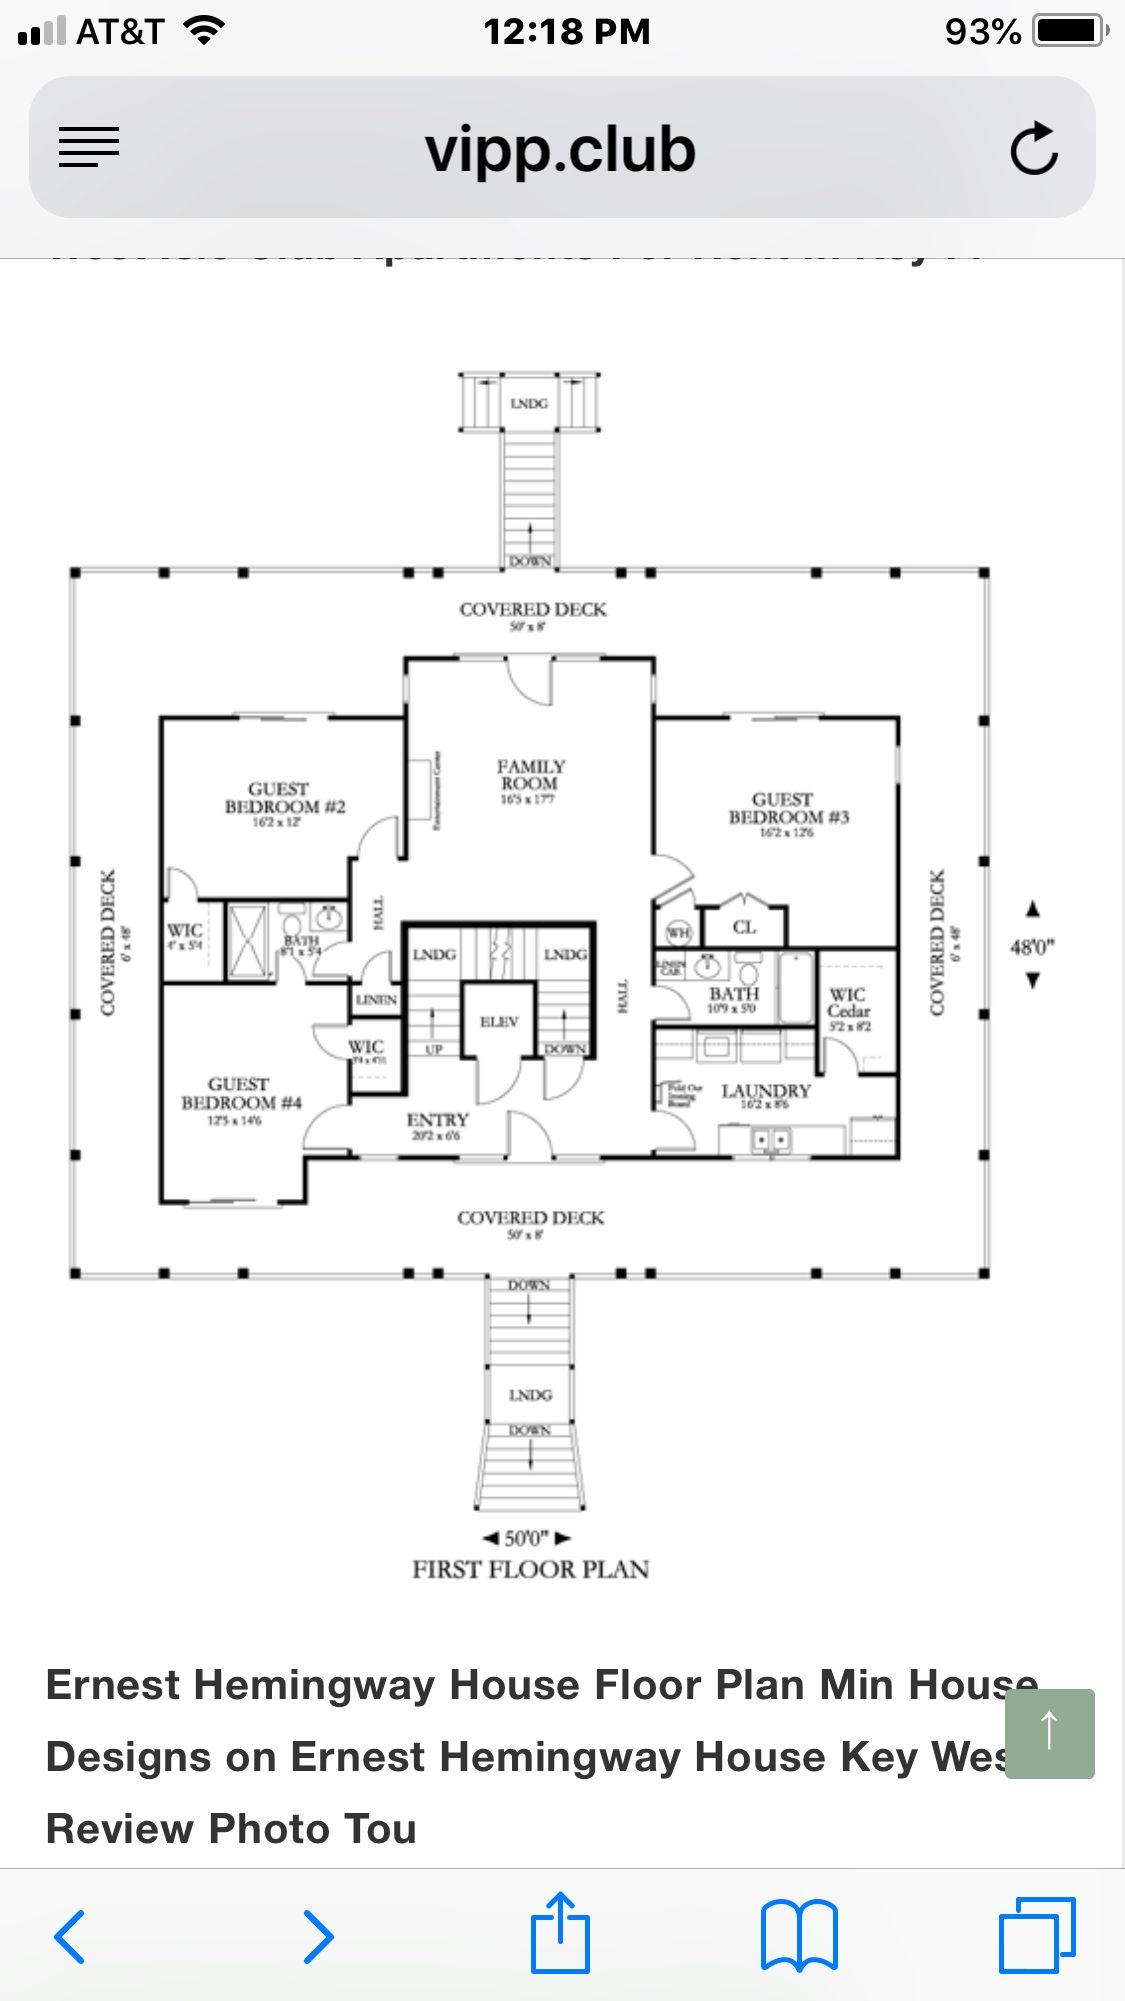 Pin By Tracy Koeninger Henry On Hemingway House Key West New House Plans Hemingway House House Floor Plans